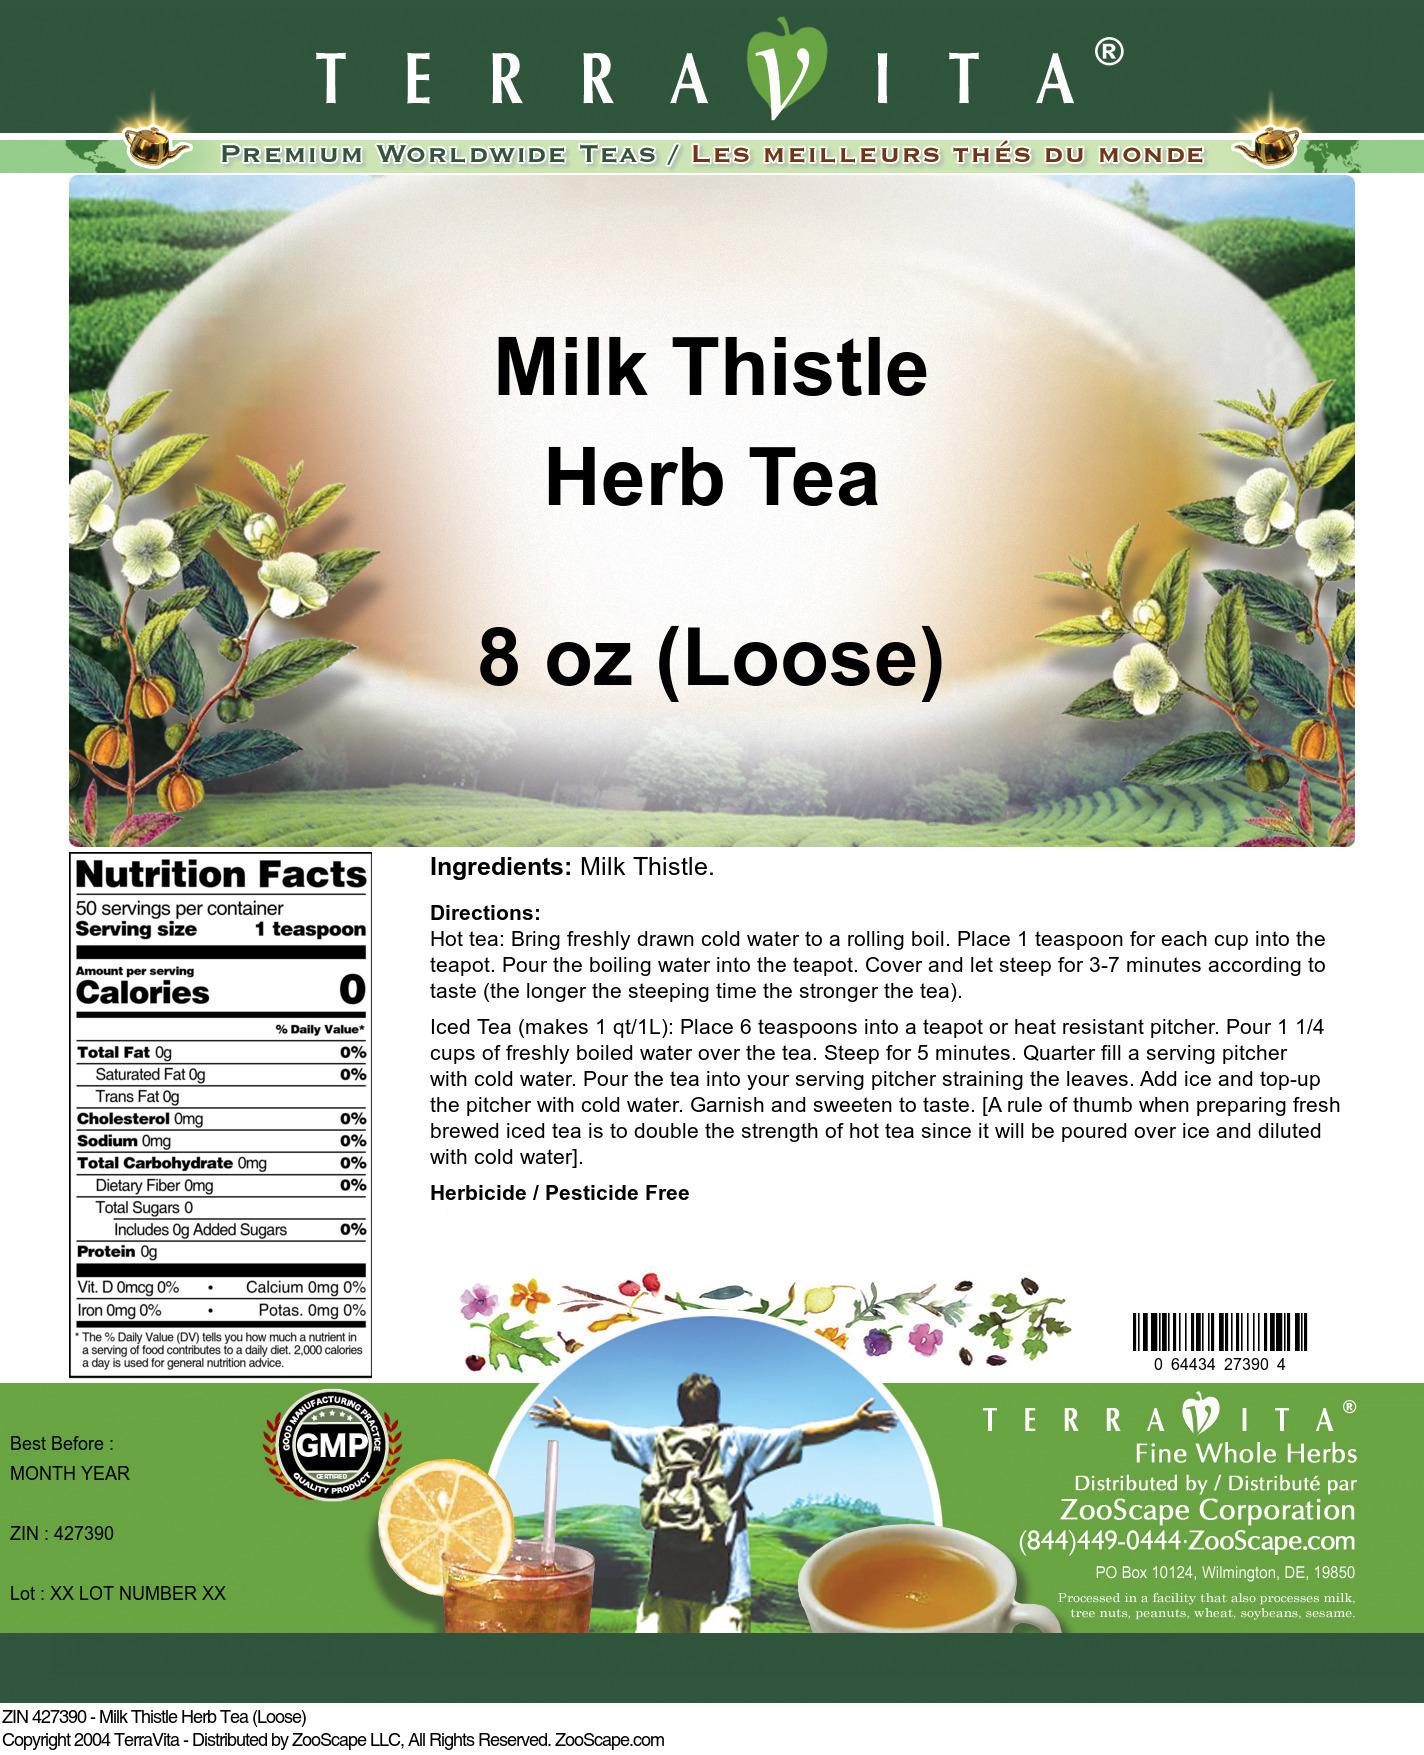 Milk Thistle Herb